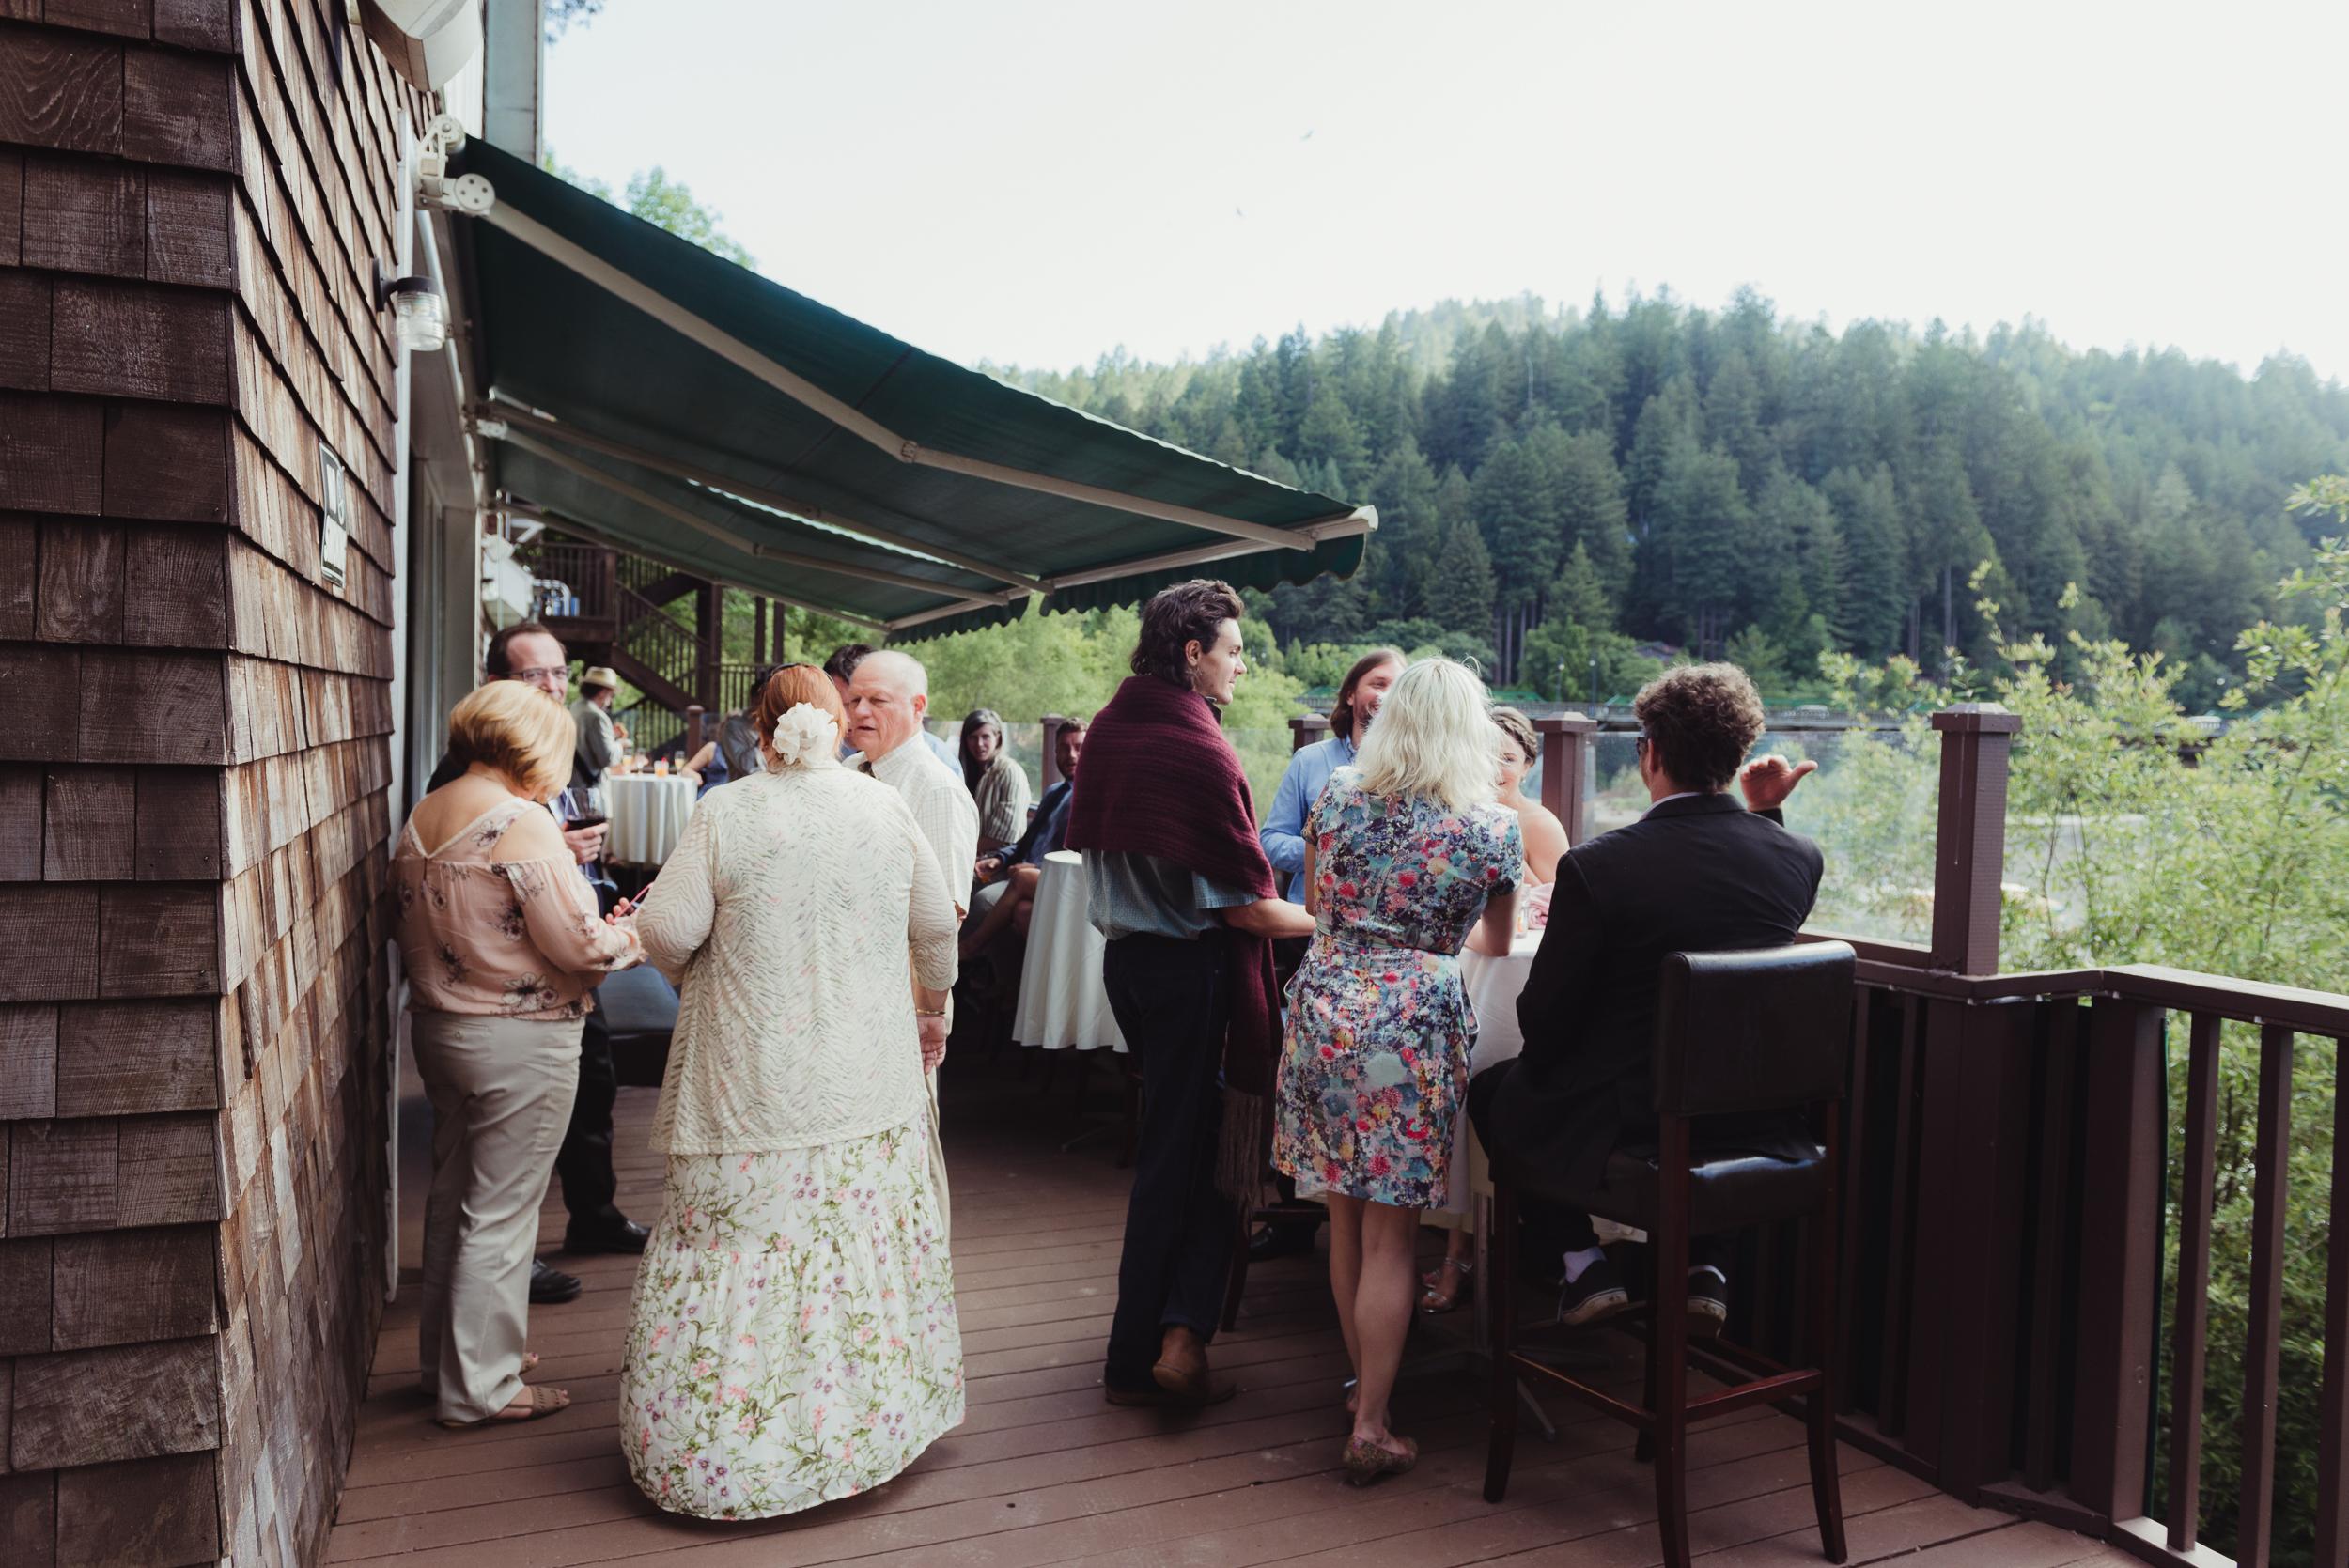 068-highland-dell-lodge-russian-river-wedding-vivianchen-418.jpg